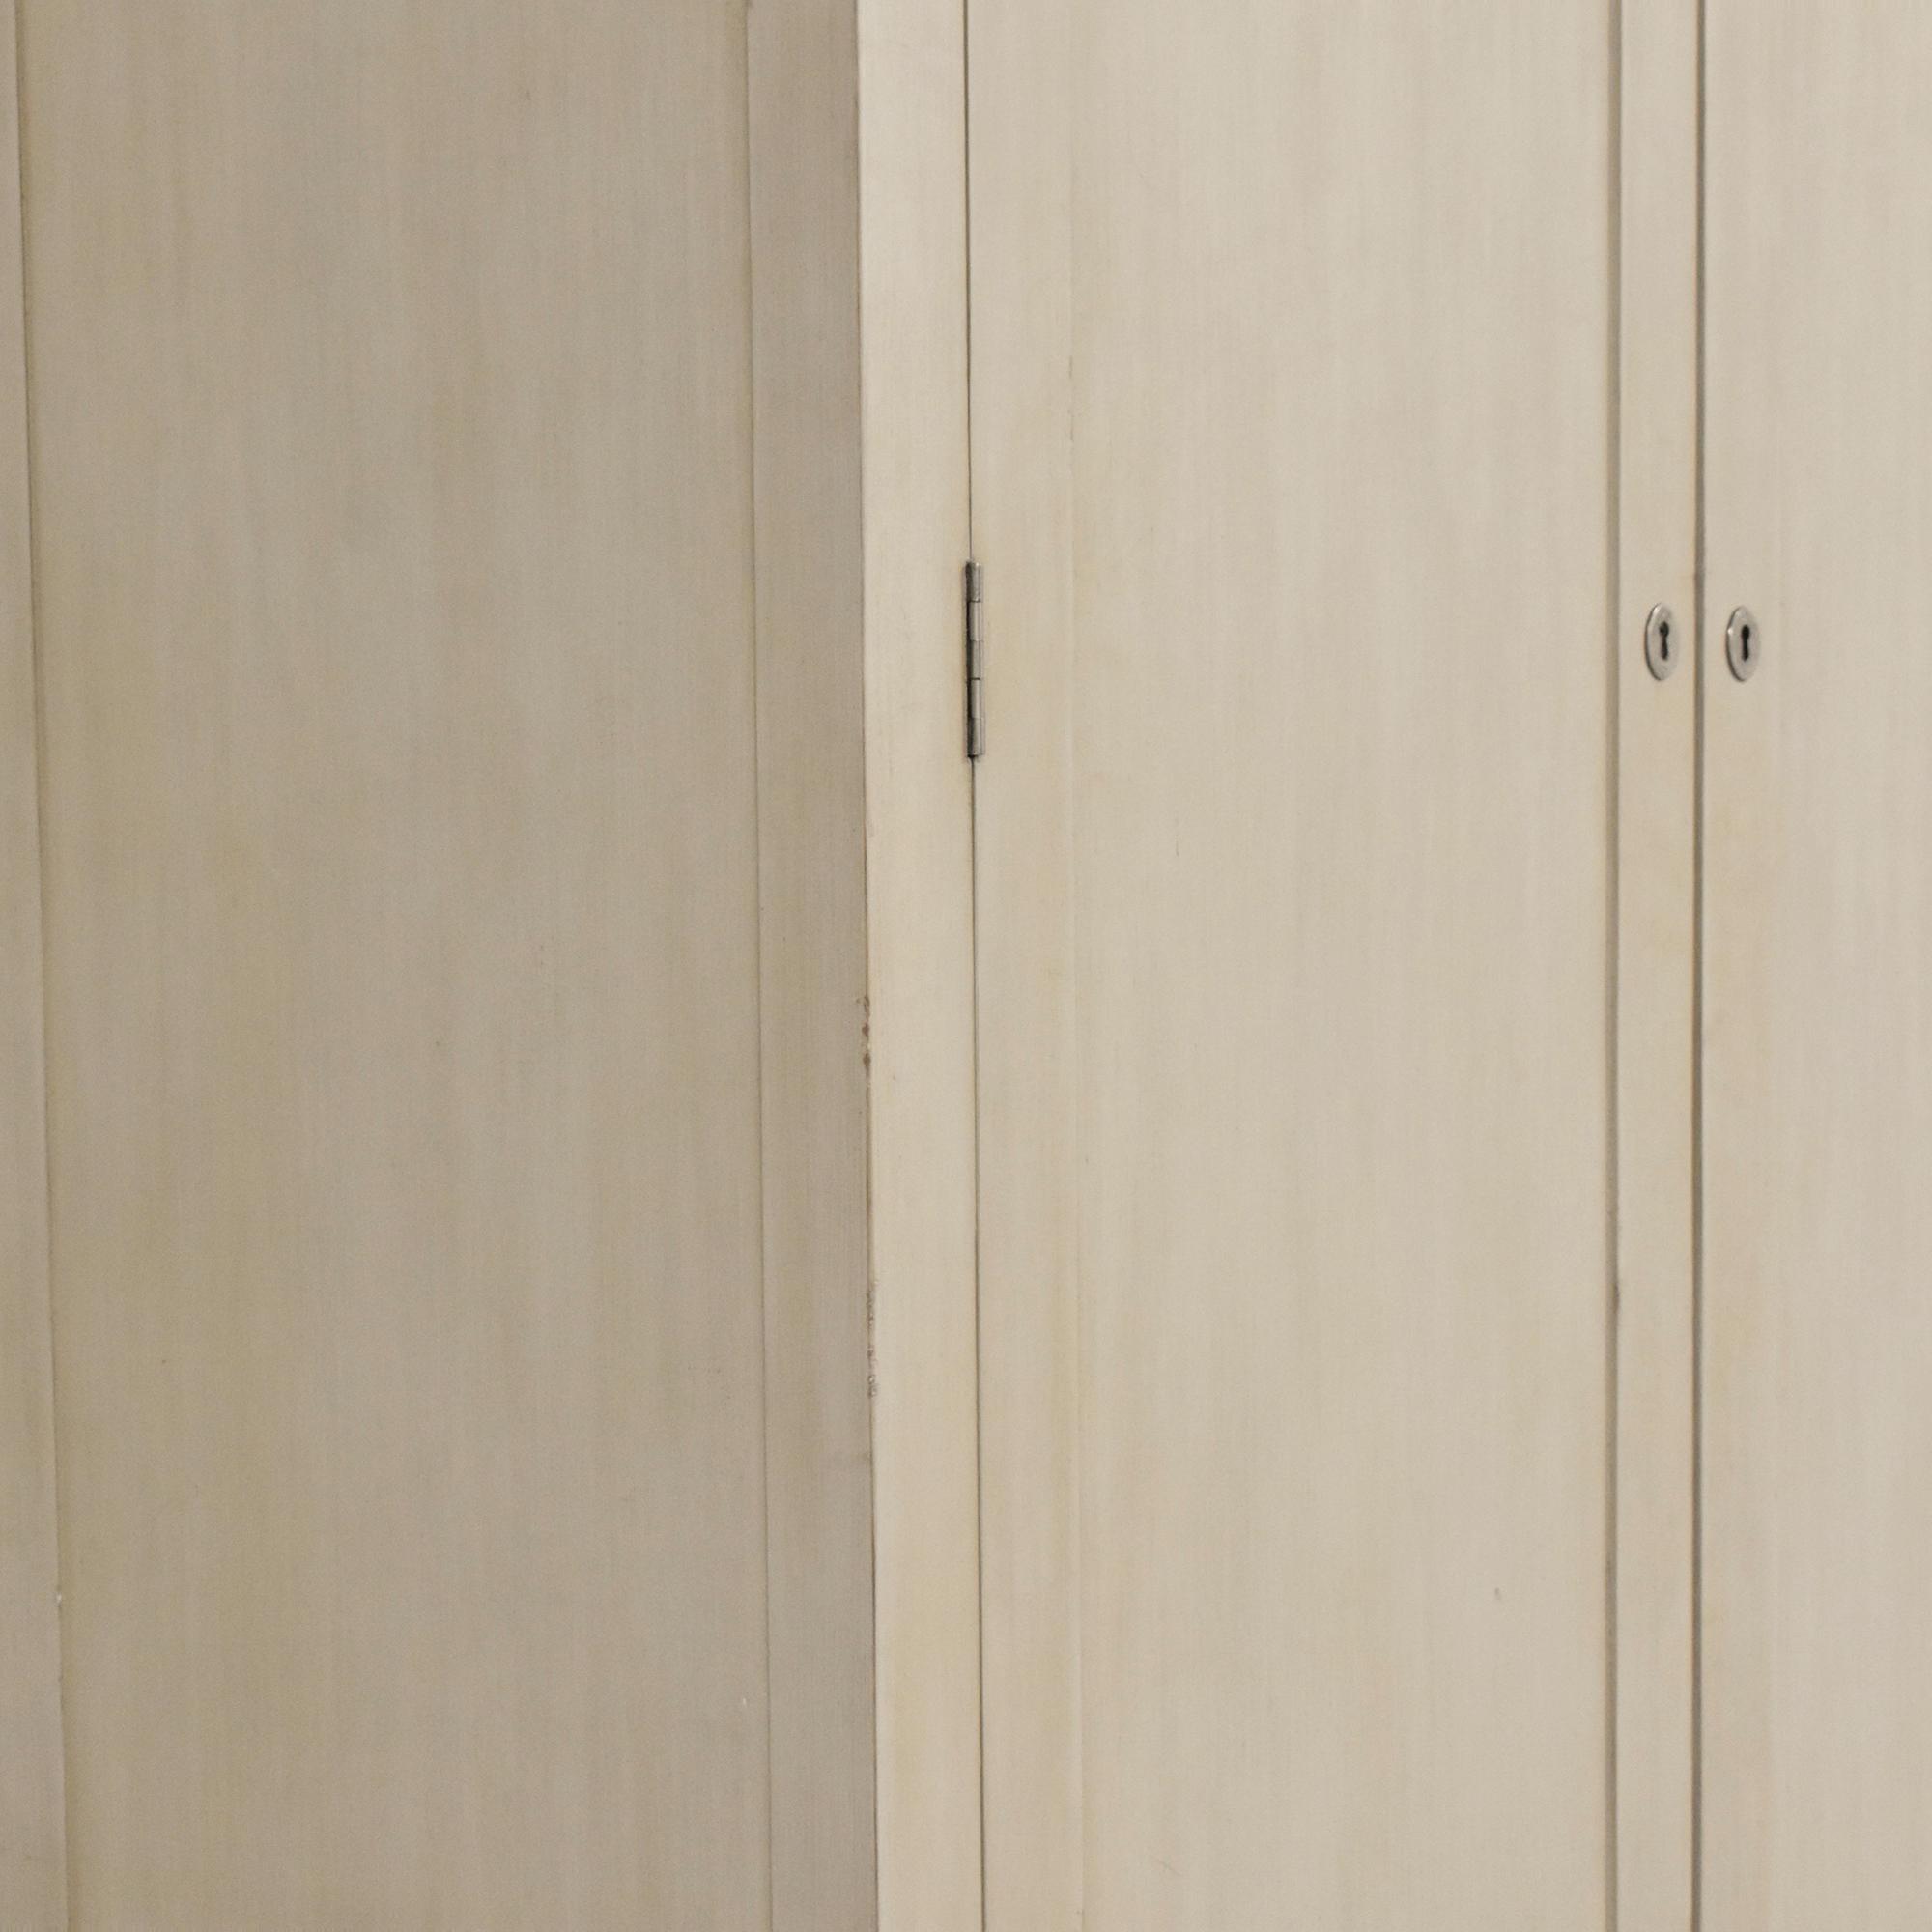 Restoration Hardware Maison Armoire / Wardrobes & Armoires